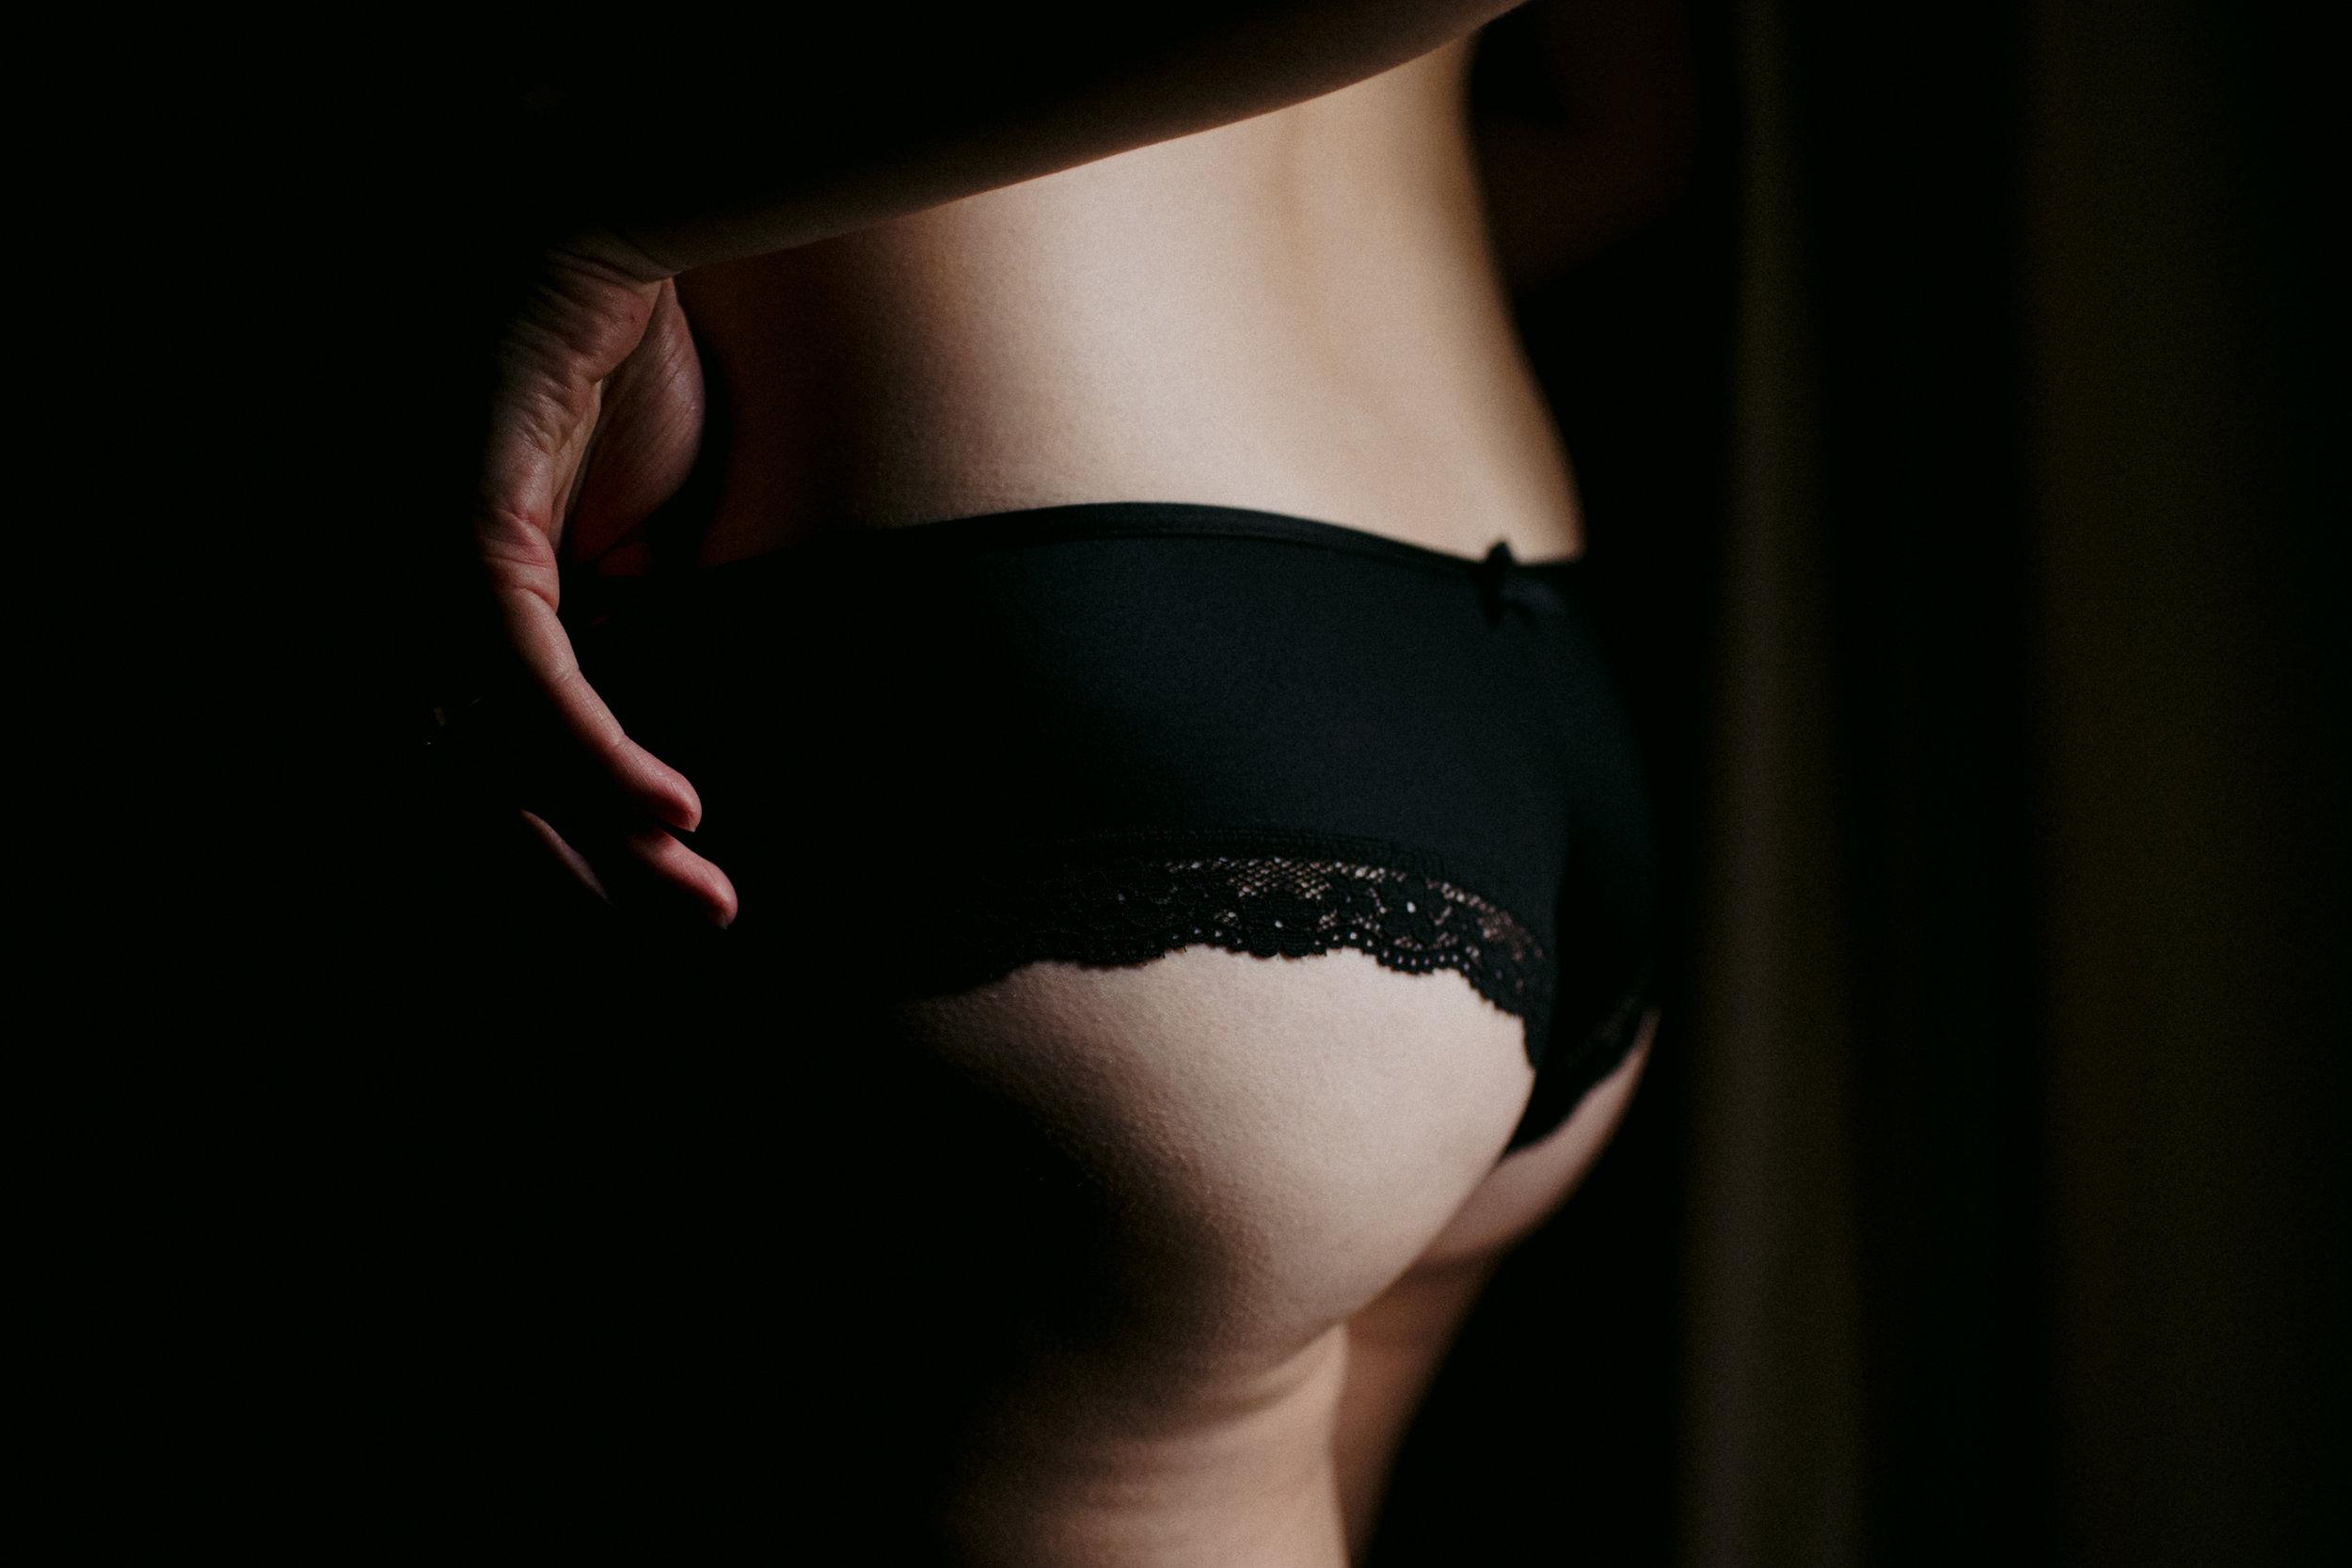 washington-dc-boudoir-photo.jpg